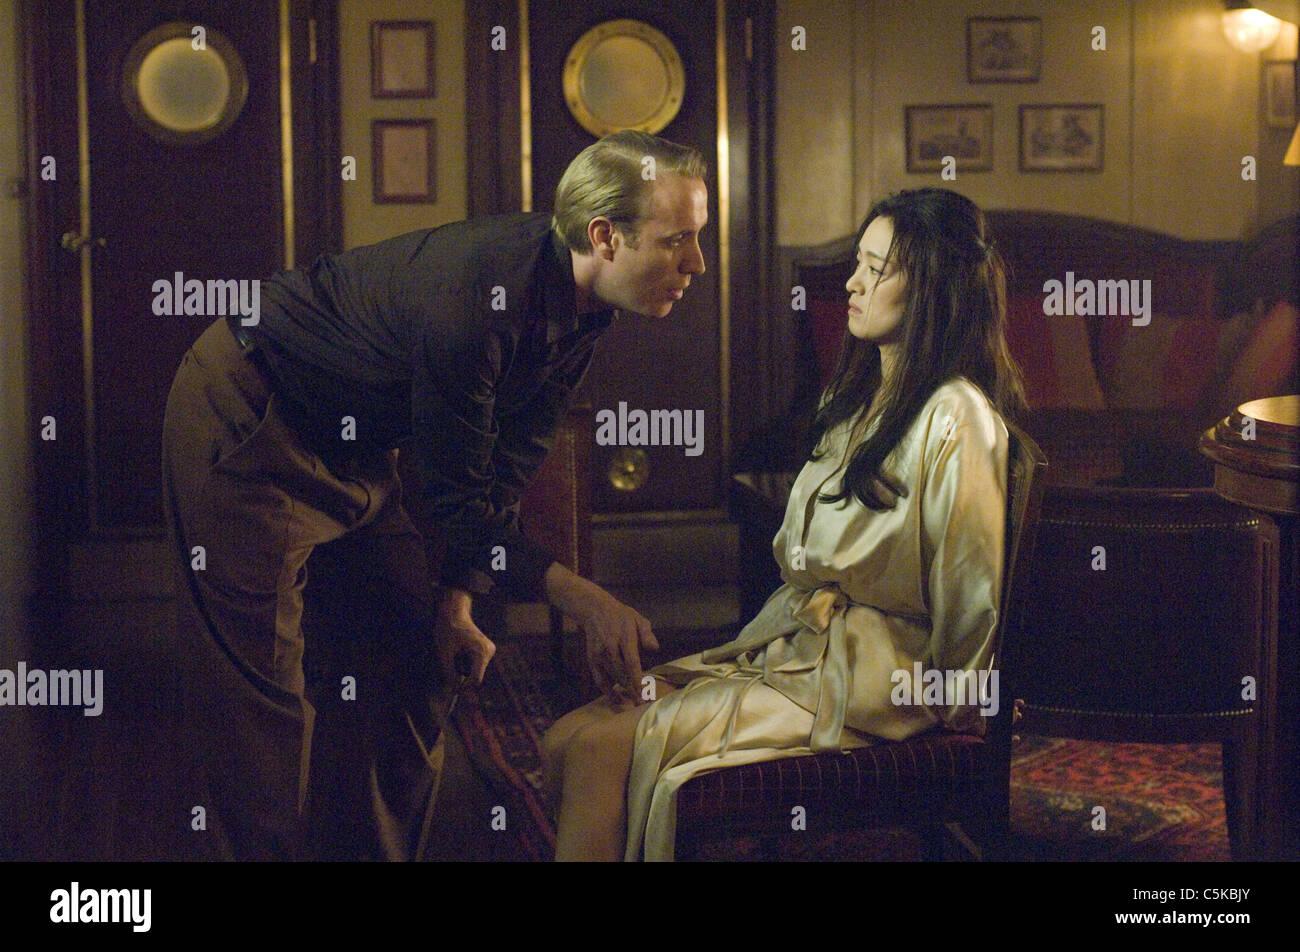 Hannibal Rising  Year: 2007 - France / UK / USA Rhys Ifans, Gong Li  Director: Peter Webber Stock Photo